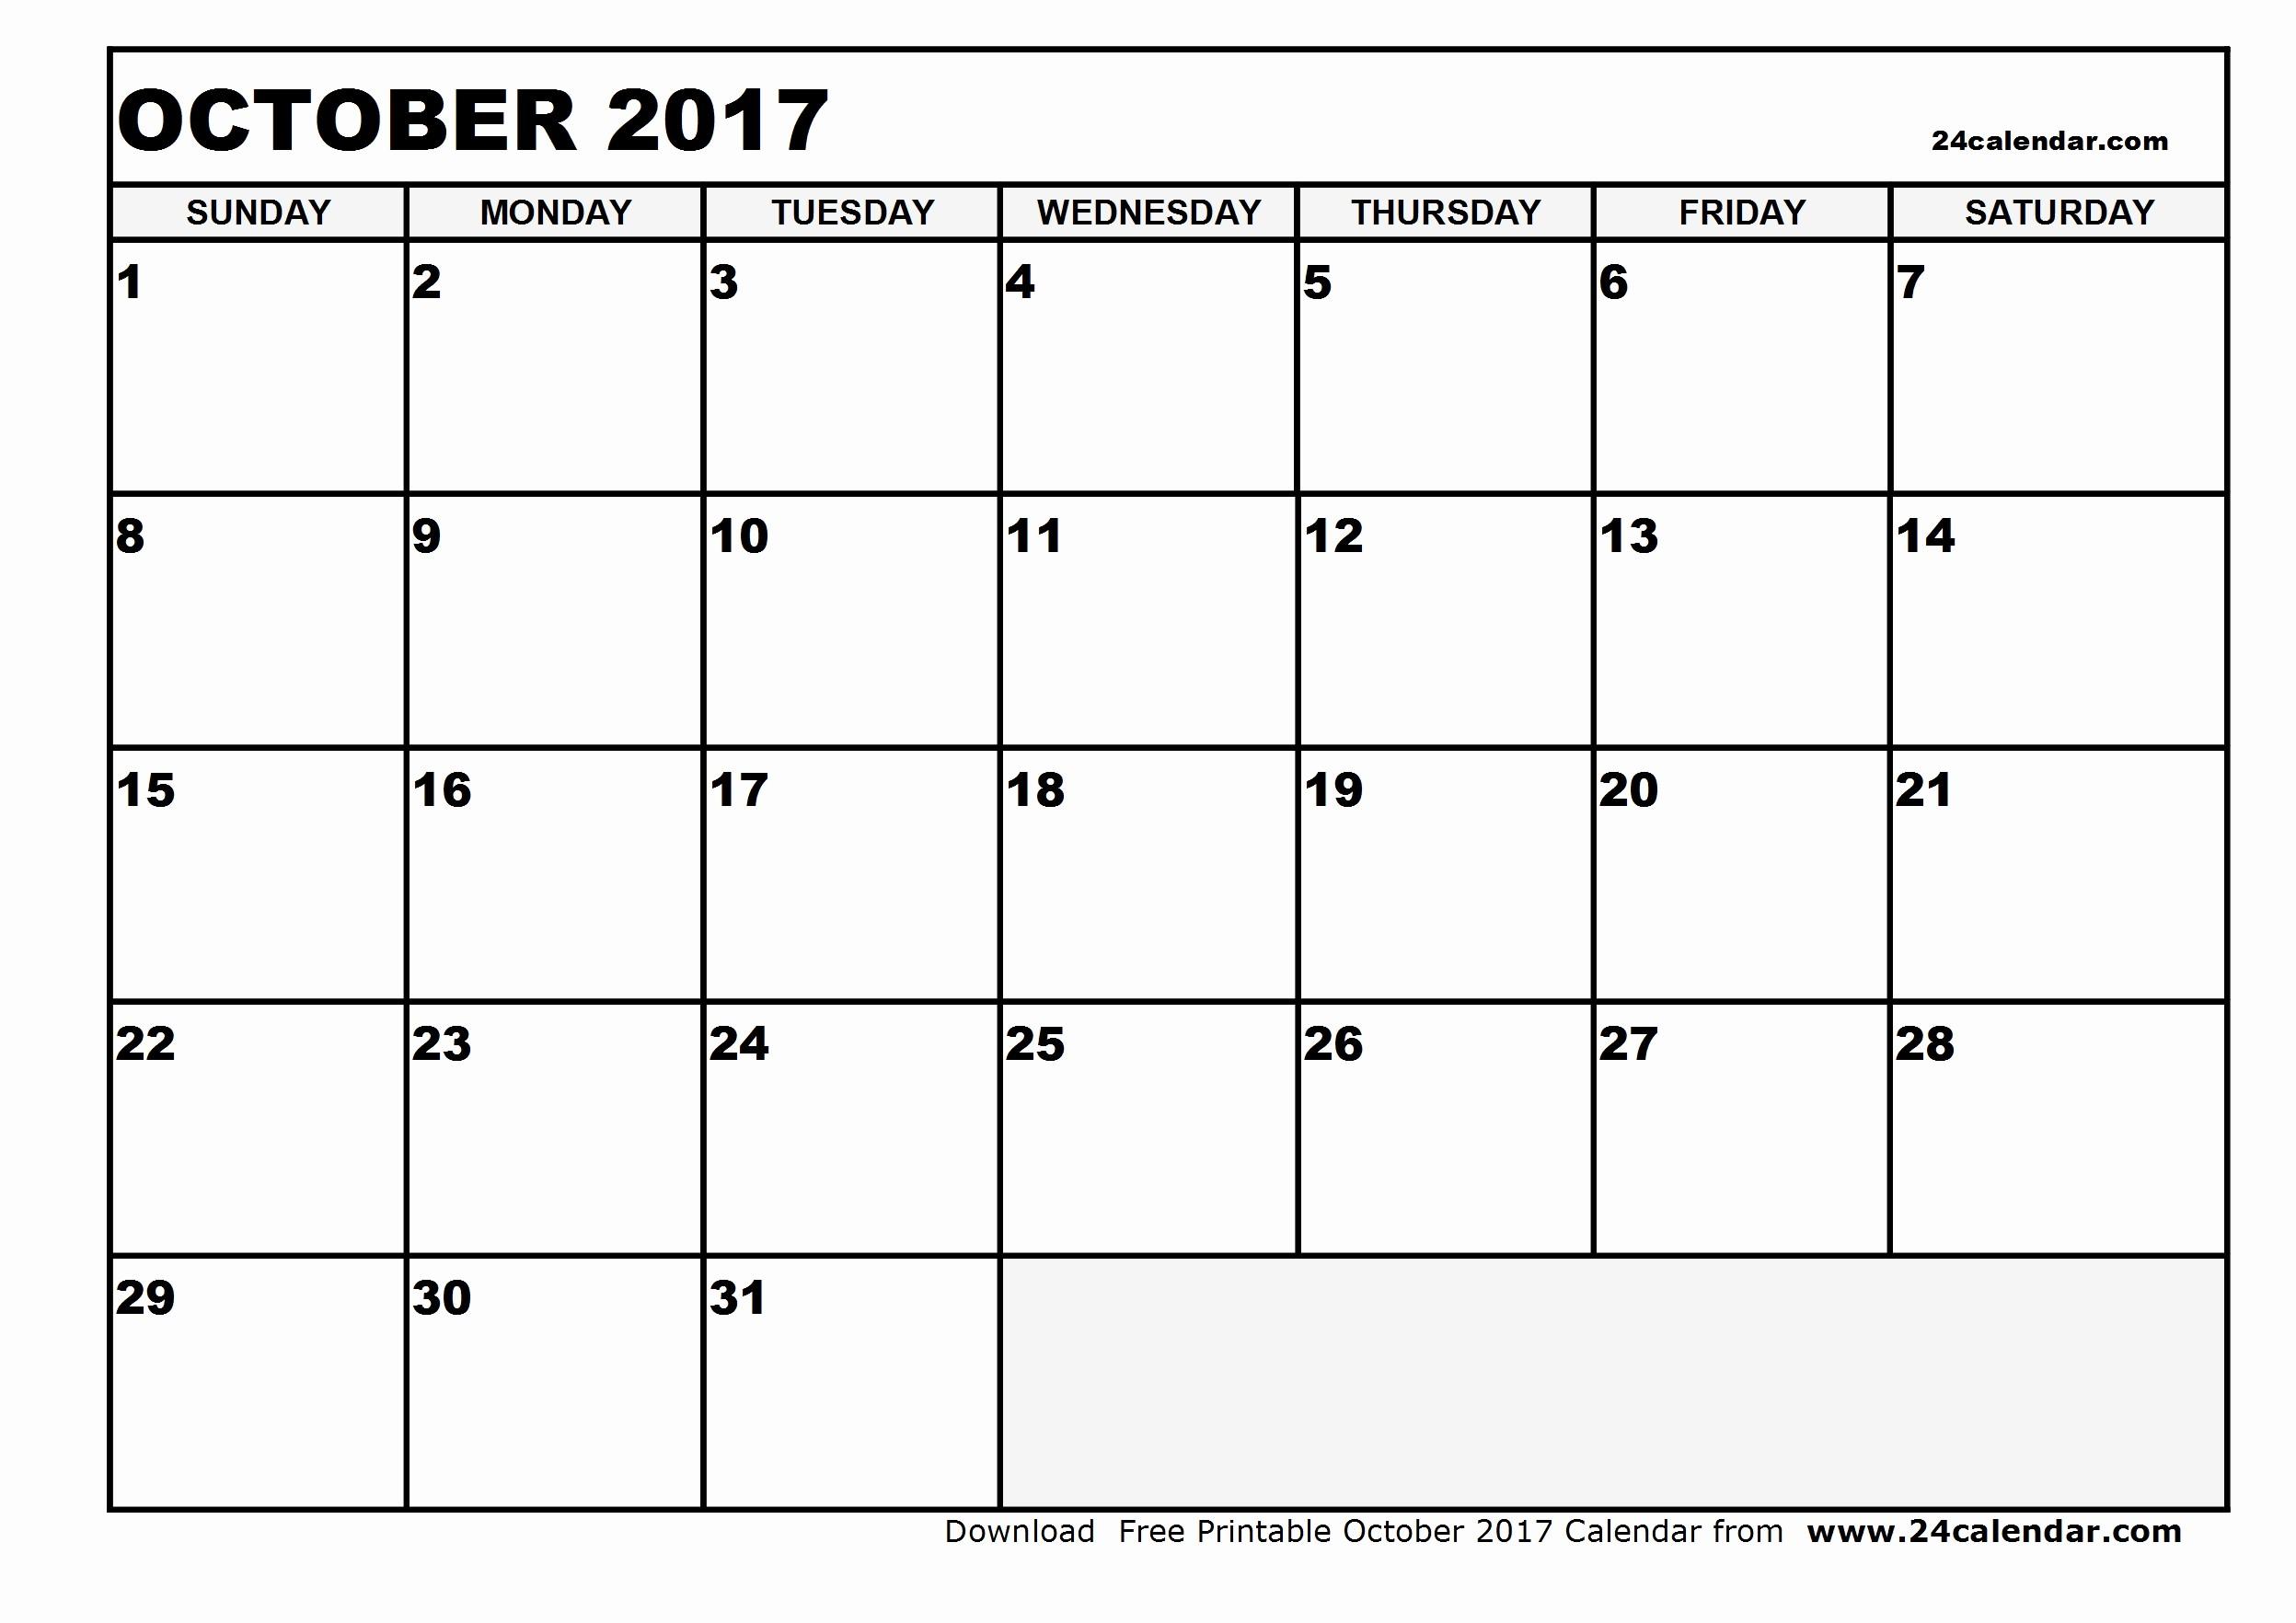 Free Blank Printable Calendar 2017 Lovely Blank October 2017 Calendar In Printable format